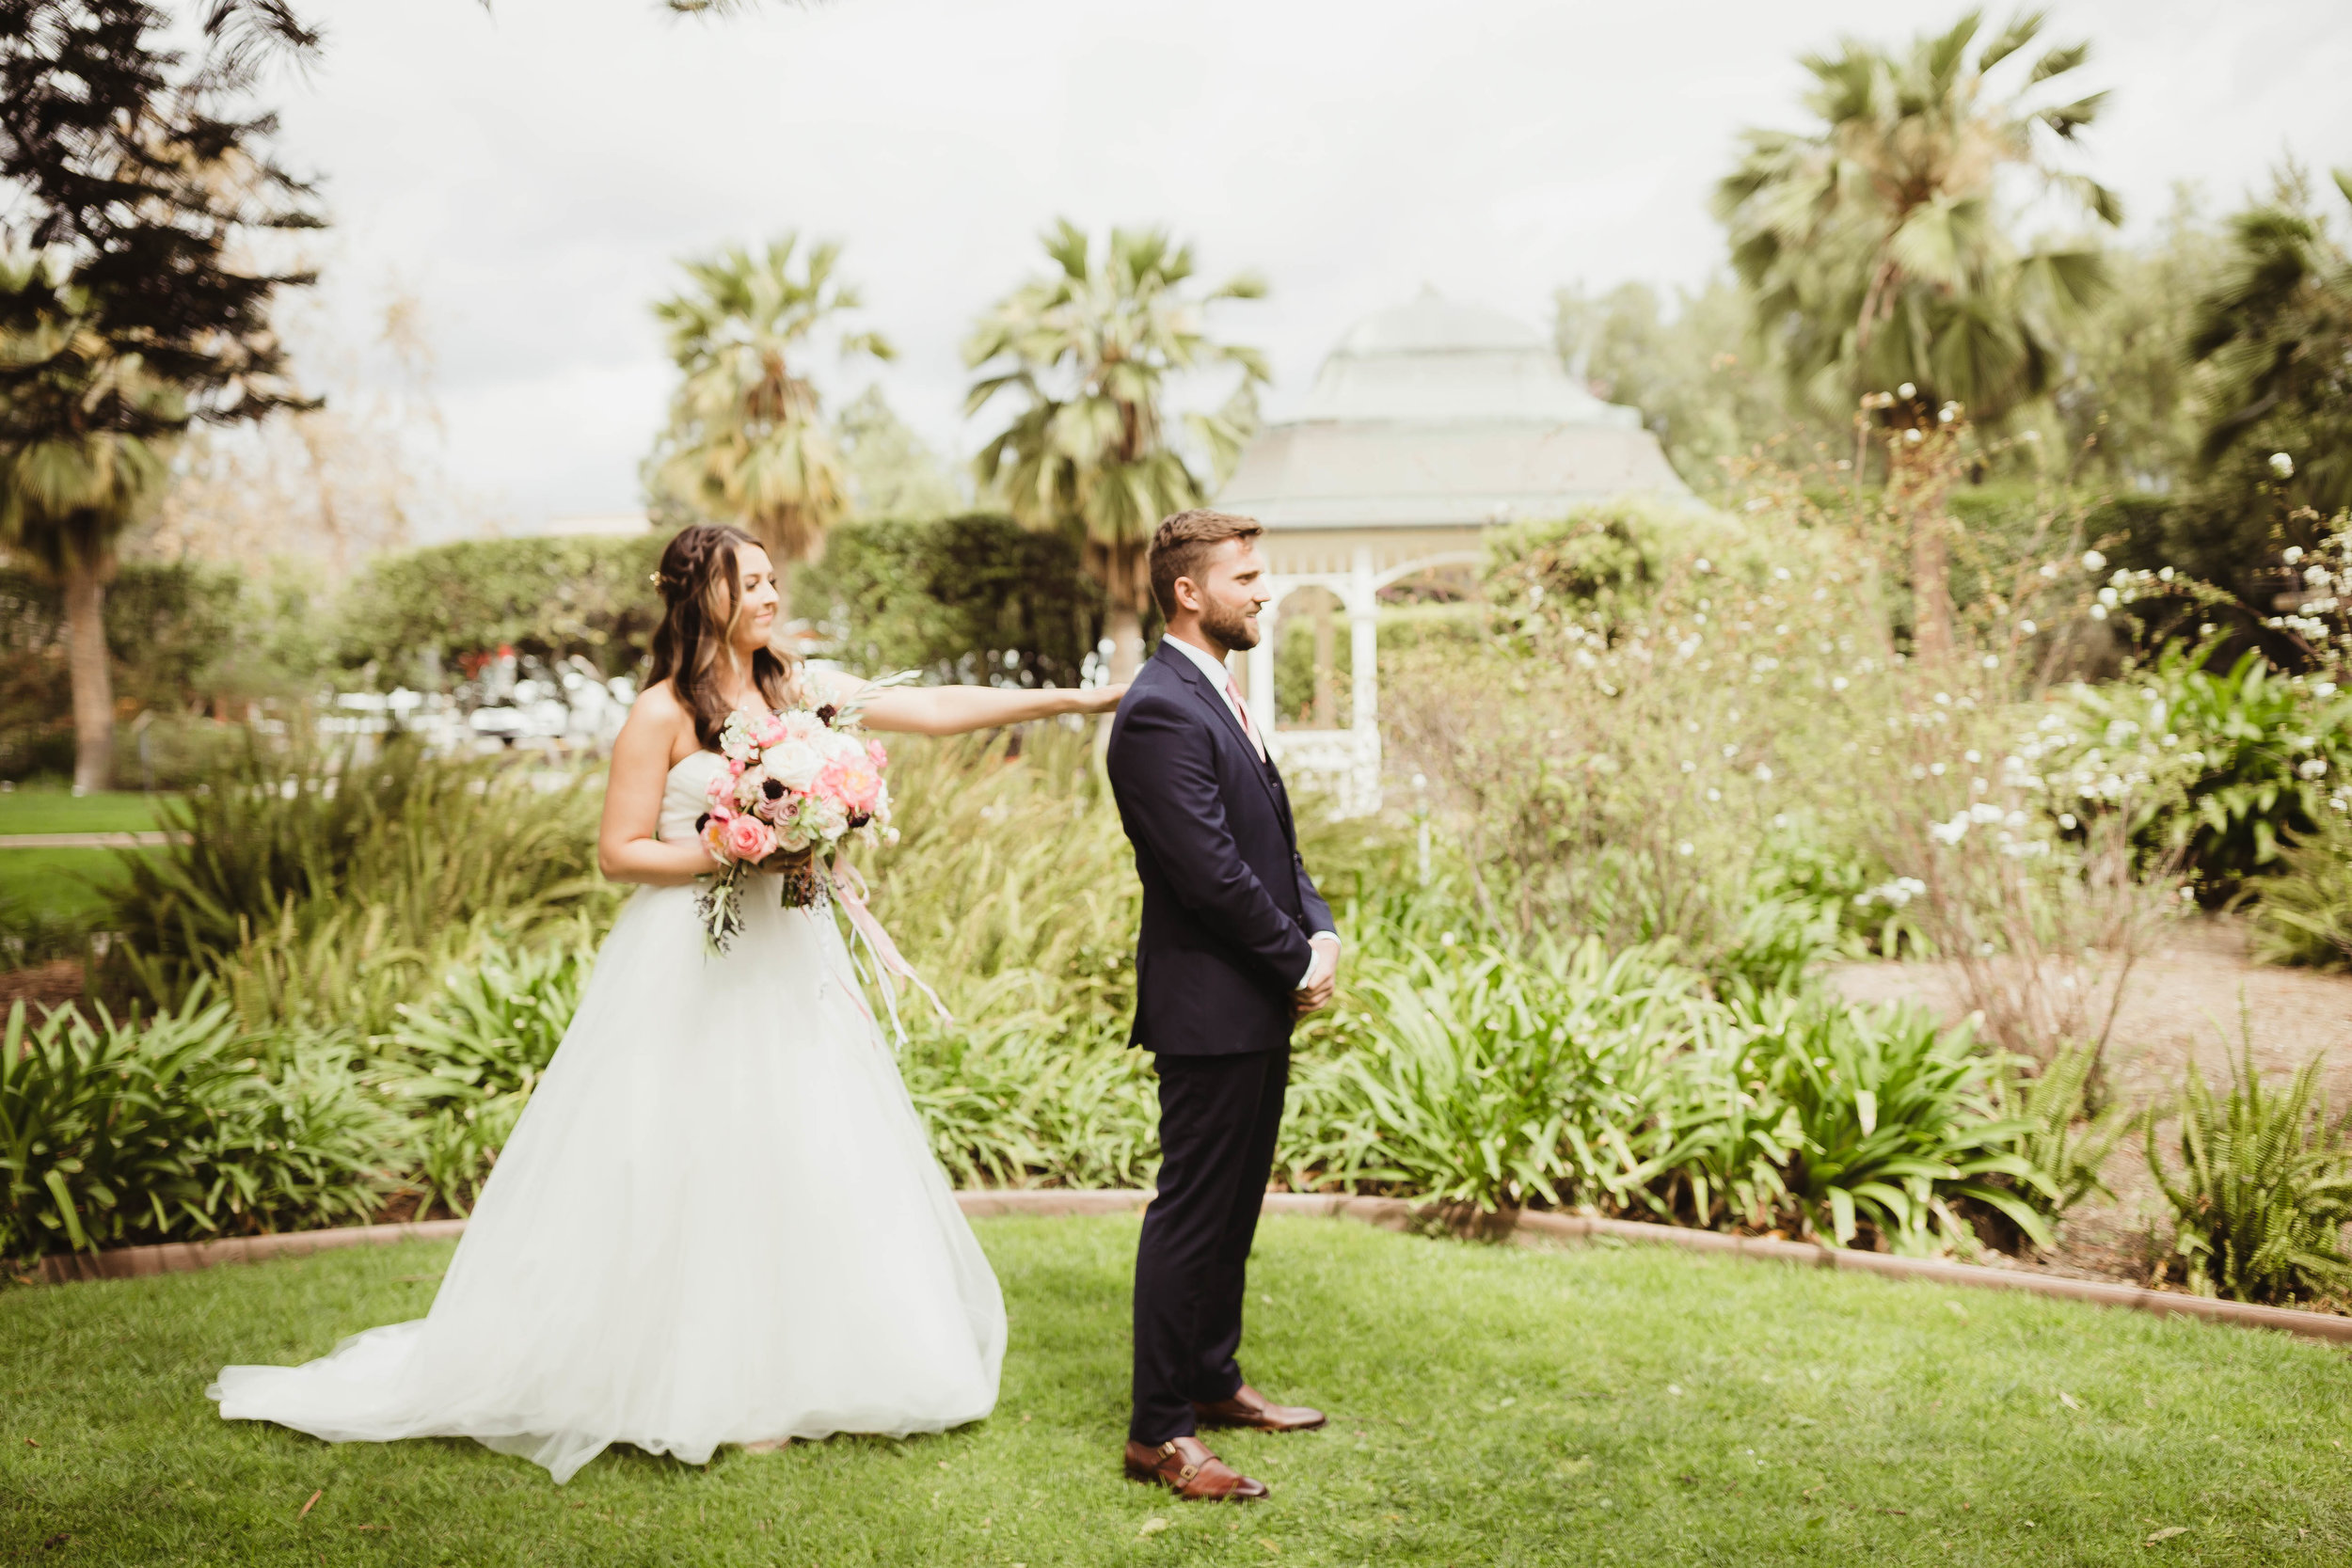 Blake and Cassidy Camarillo California Wedding 87.jpg